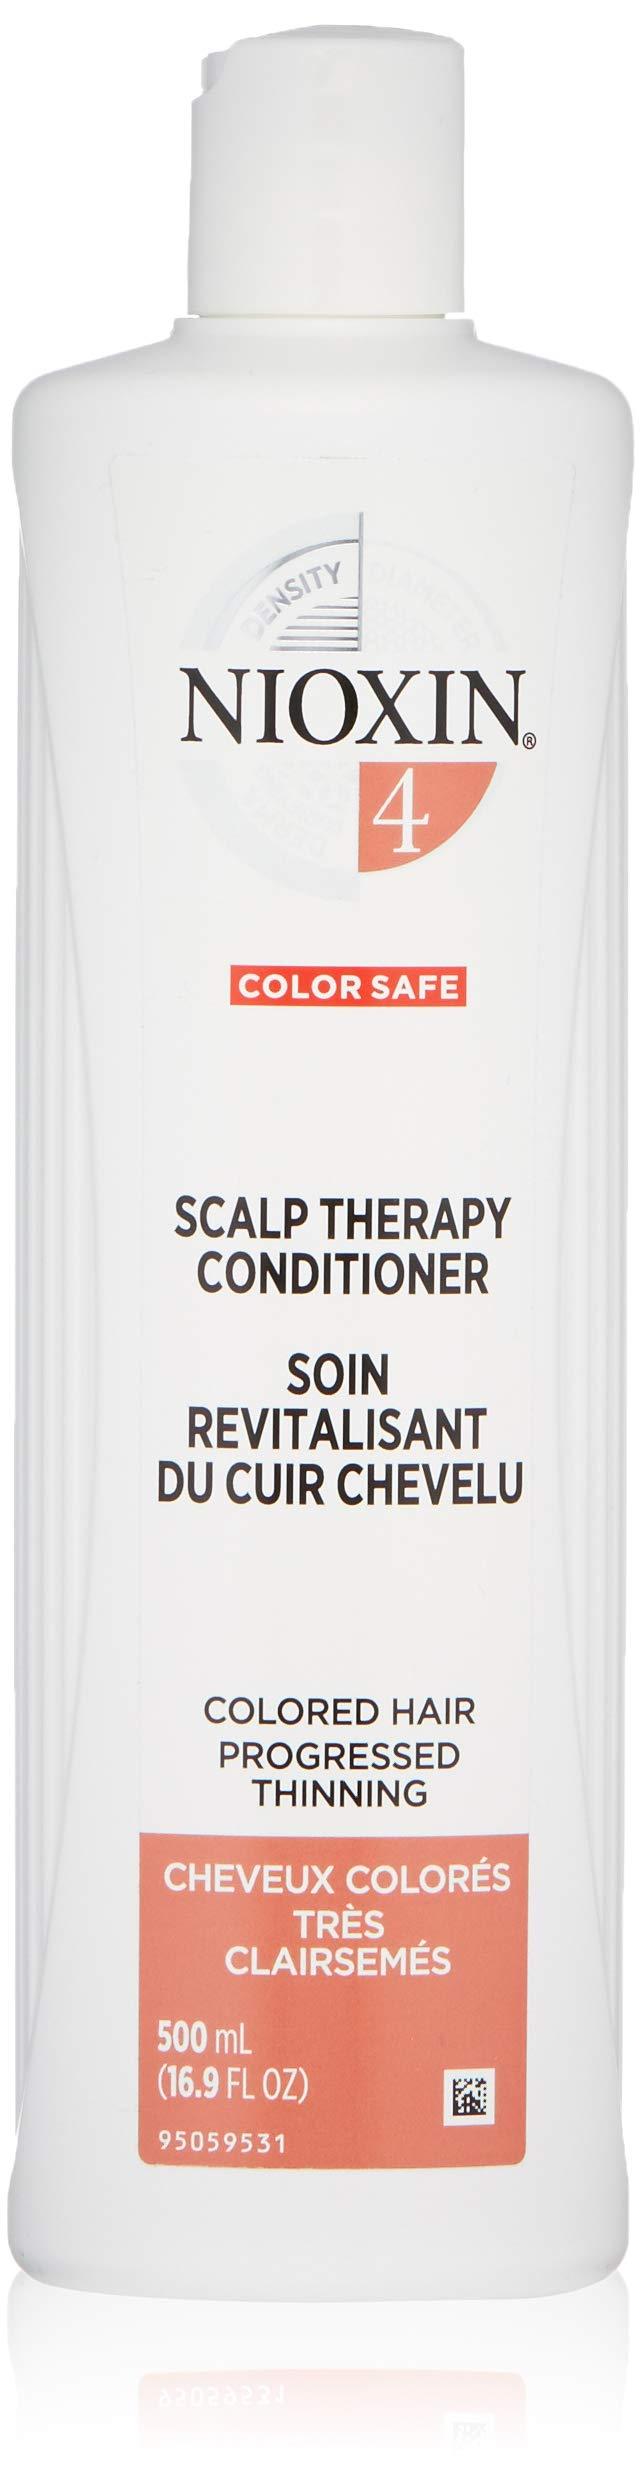 Nioxin System 4 Scalp Therapy Conditioner, 16.9 oz.